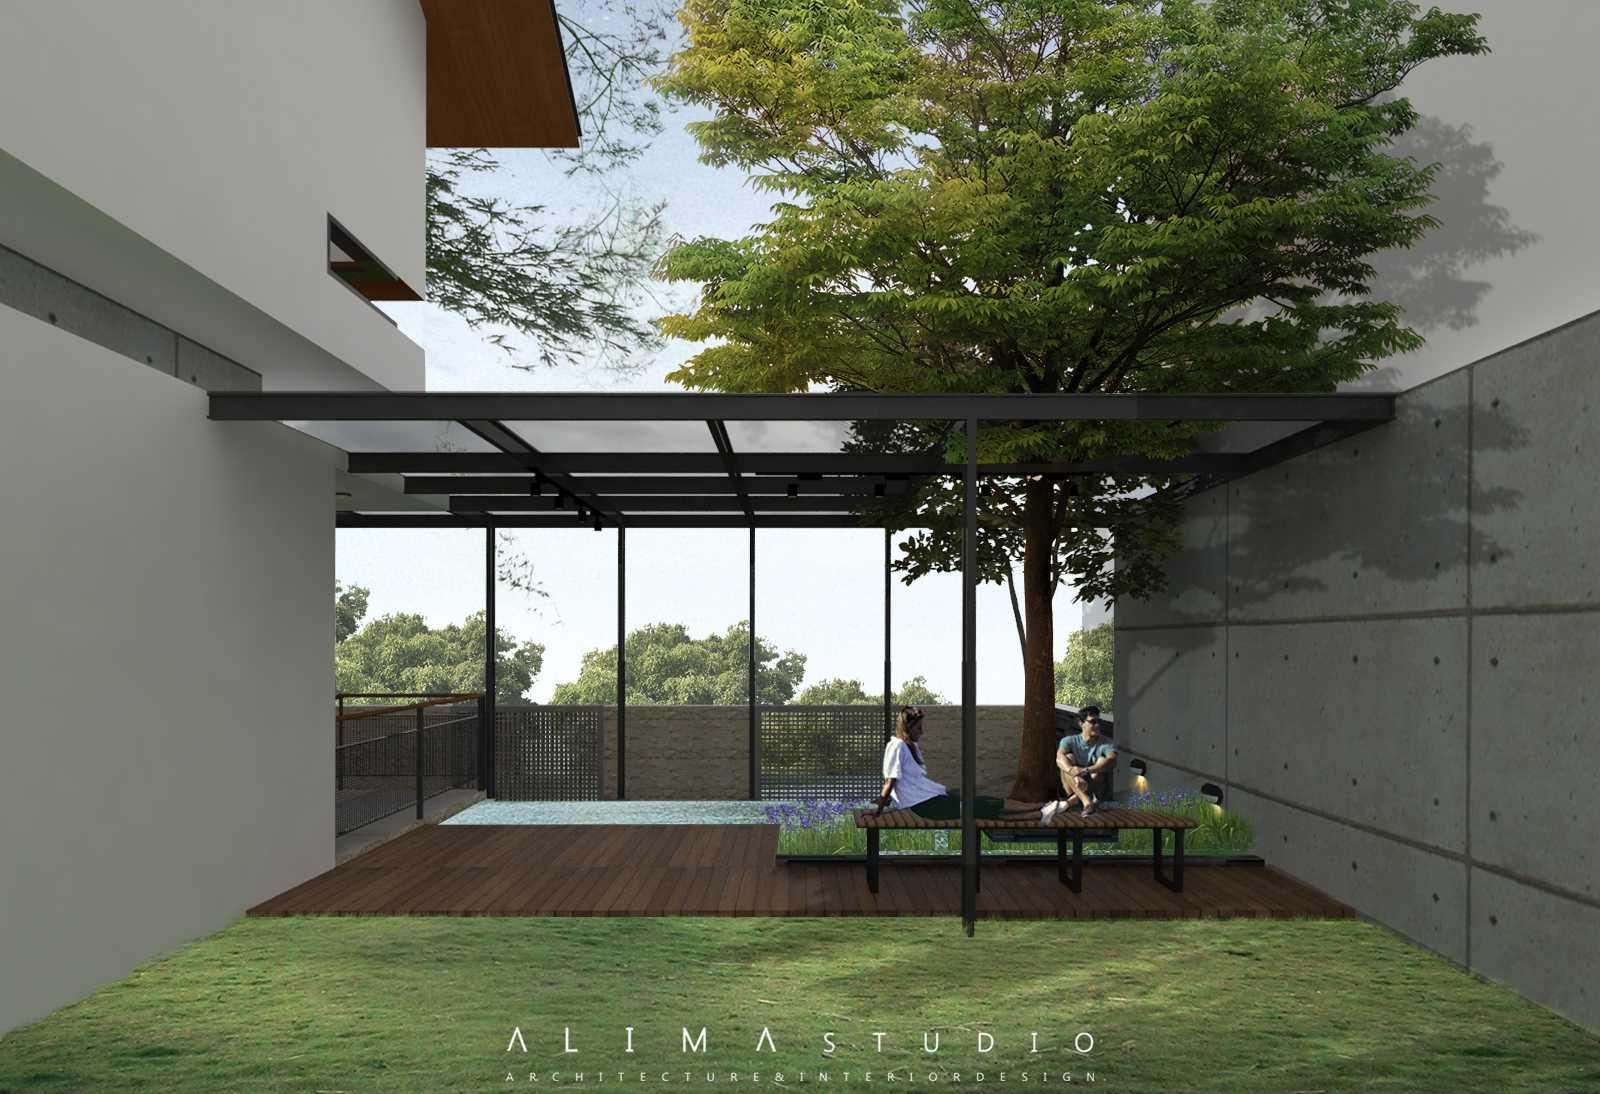 Alima Studio Sa House Makassar, Kota Makassar, Sulawesi Selatan, Indonesia Makassar, Kota Makassar, Sulawesi Selatan, Indonesia Alima-Studio-Sa-House  66971